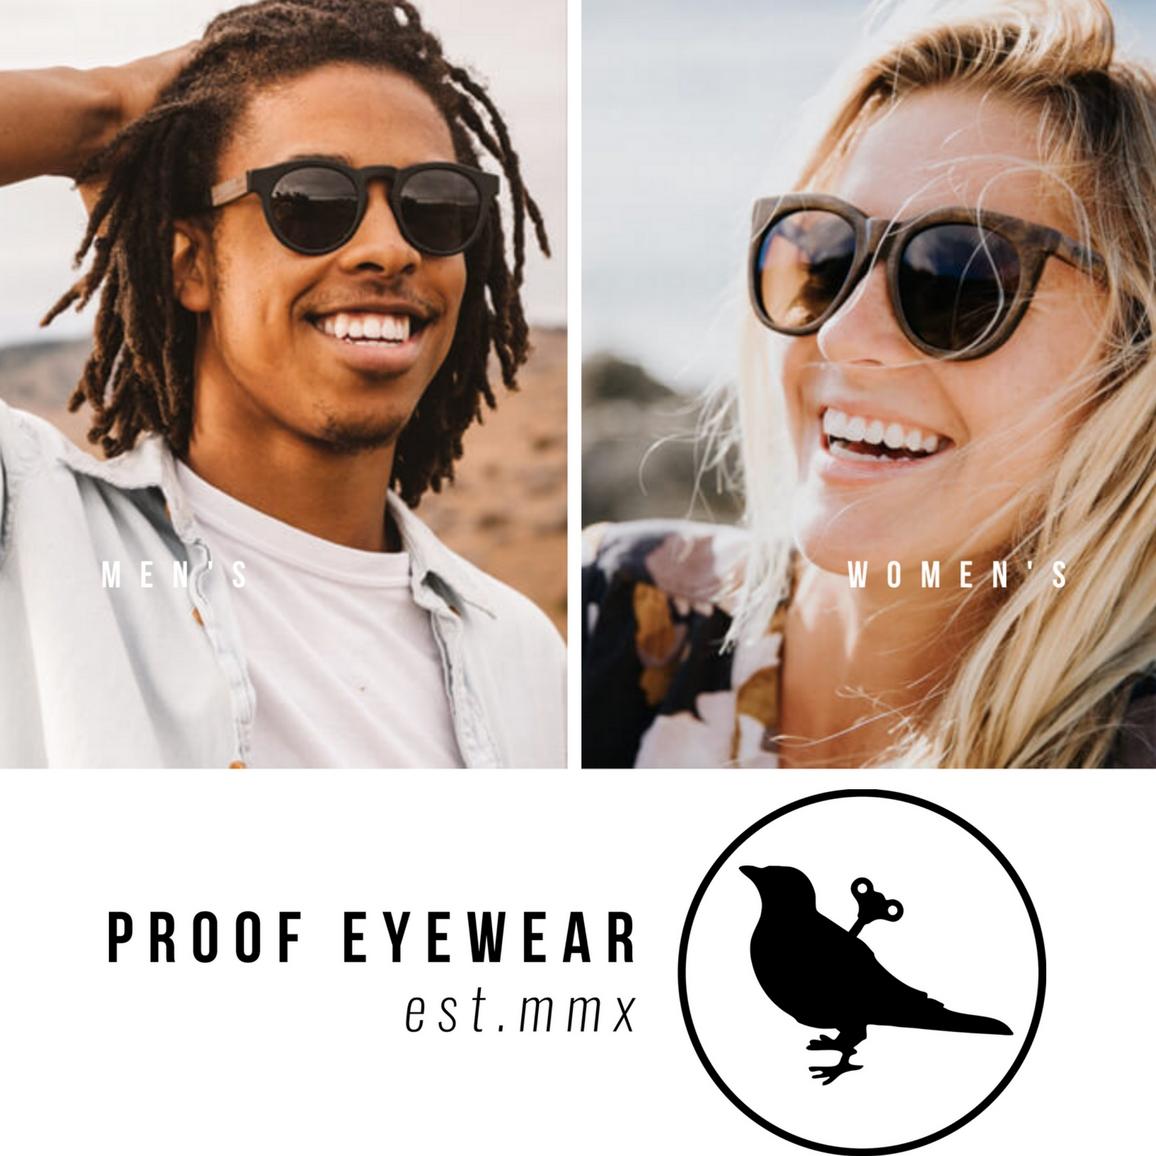 Proof Eyewear Brand image-2.jpg